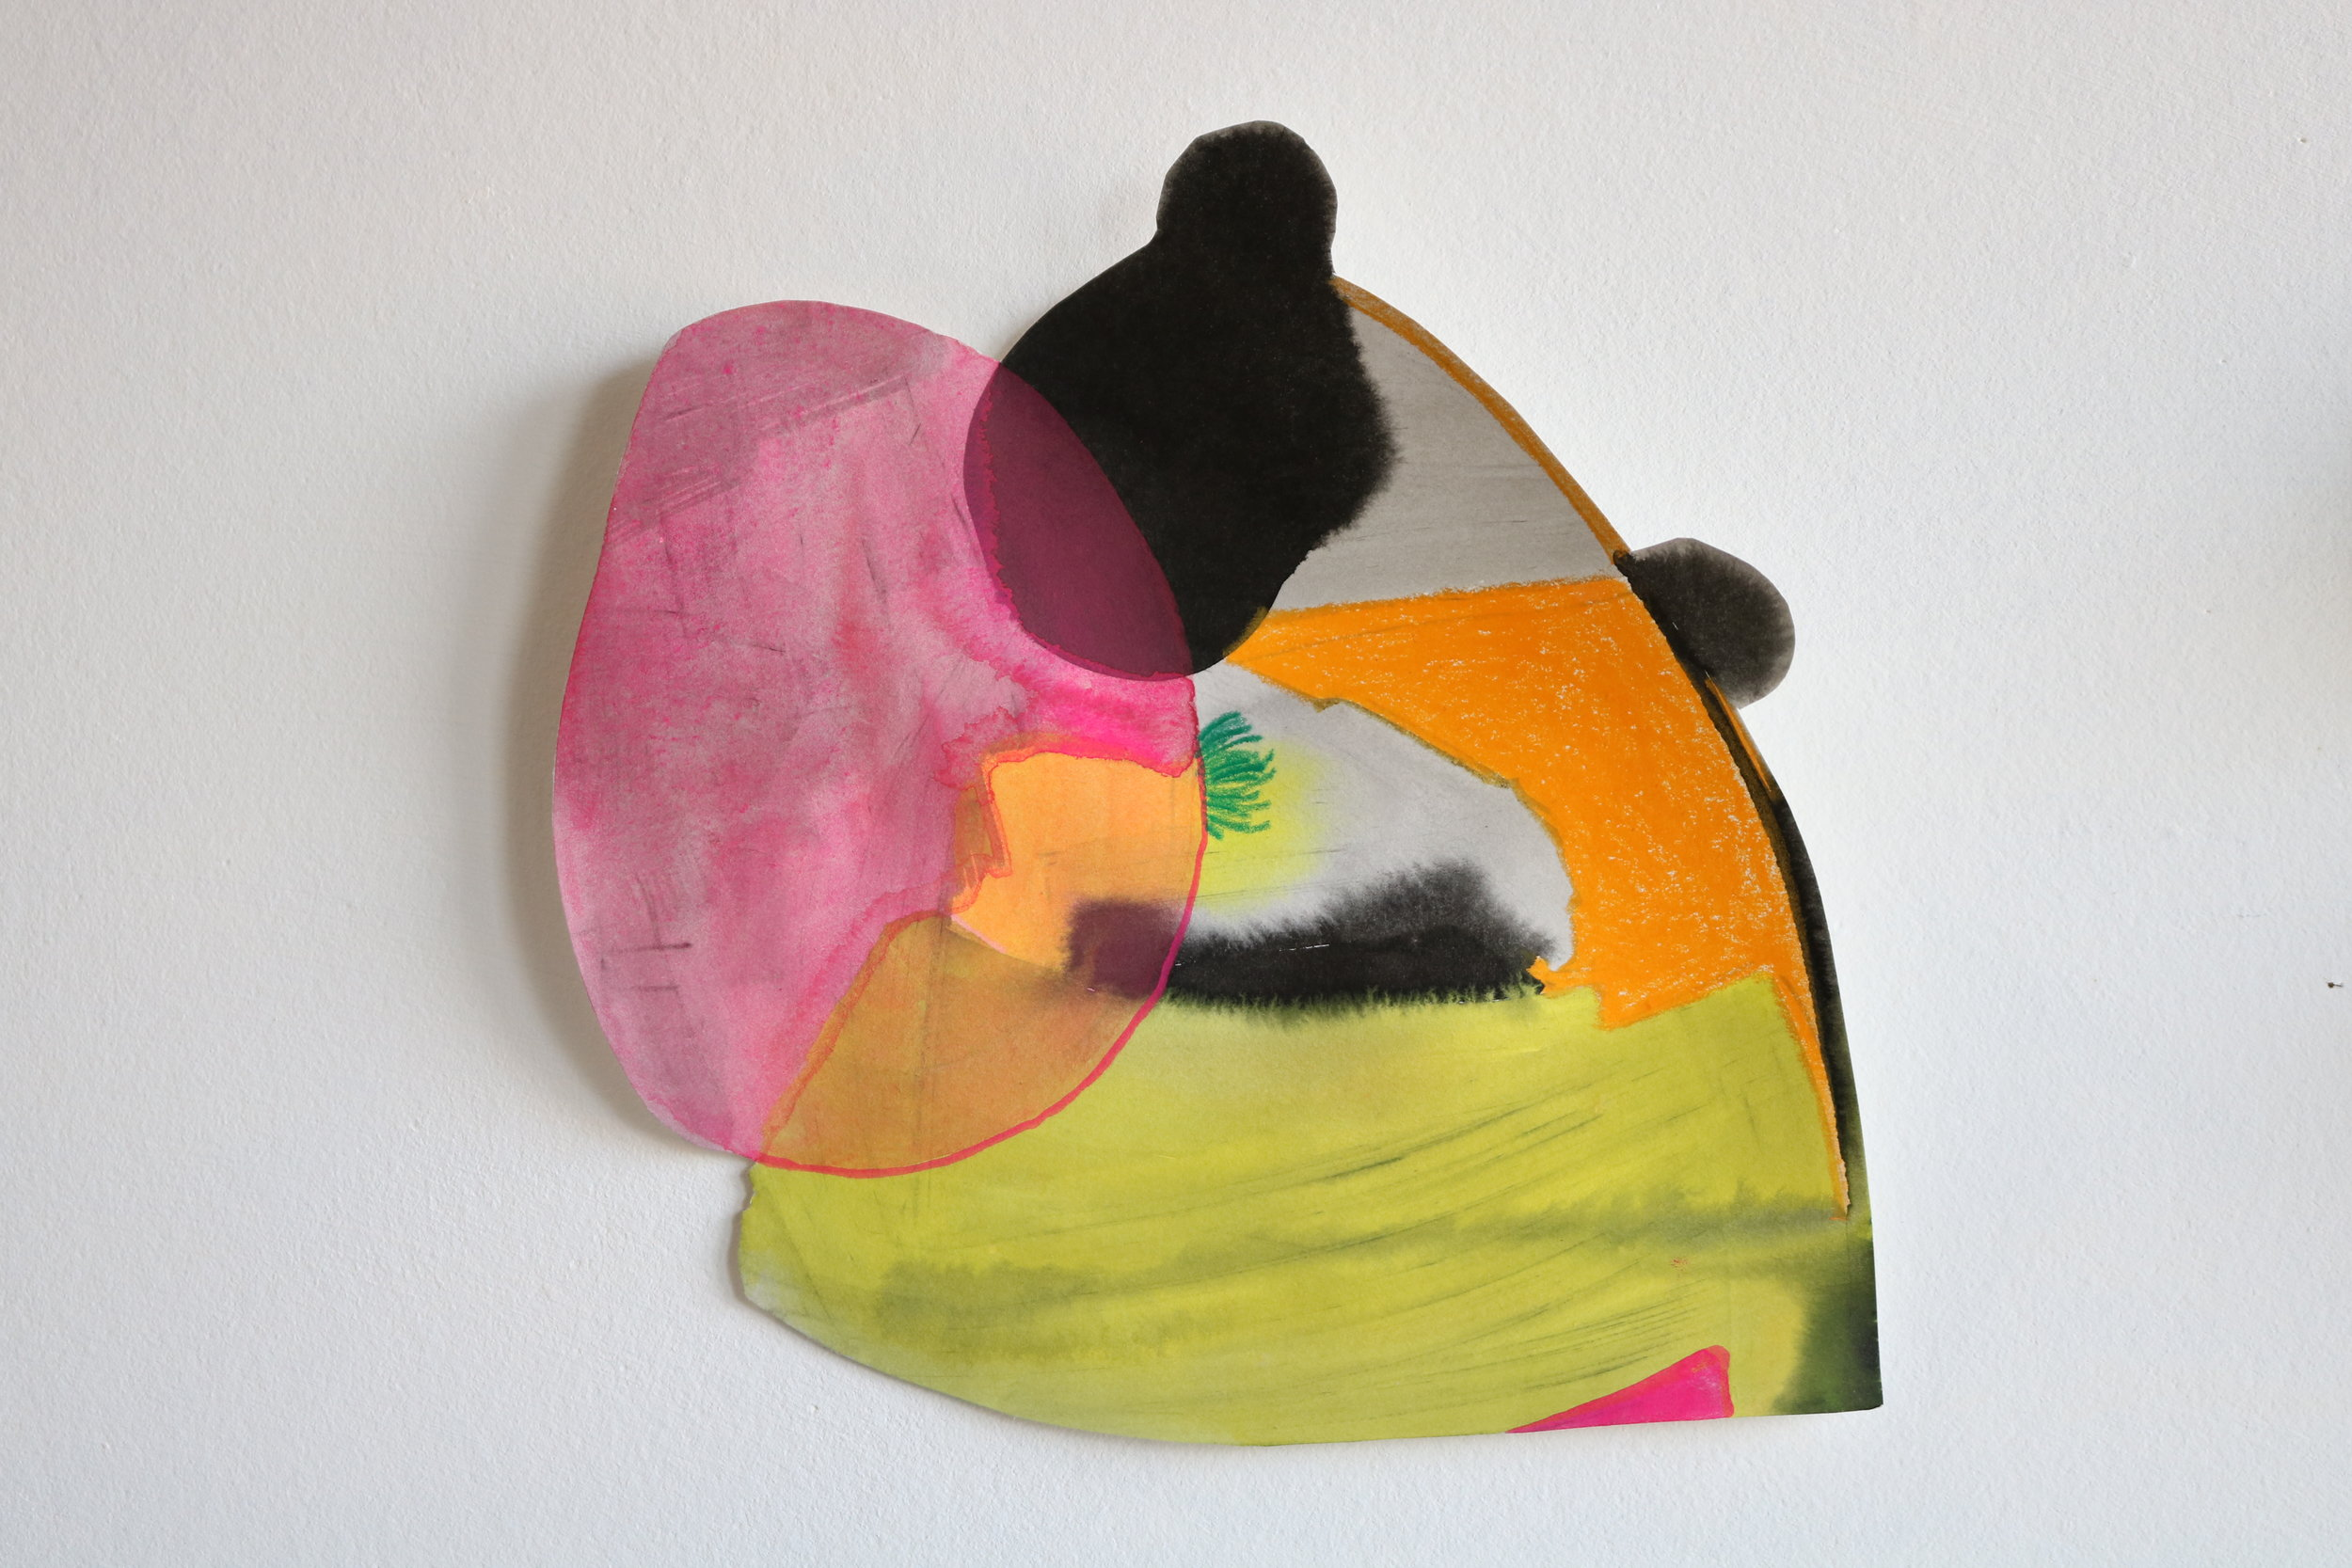 Untitled (Blob #1)